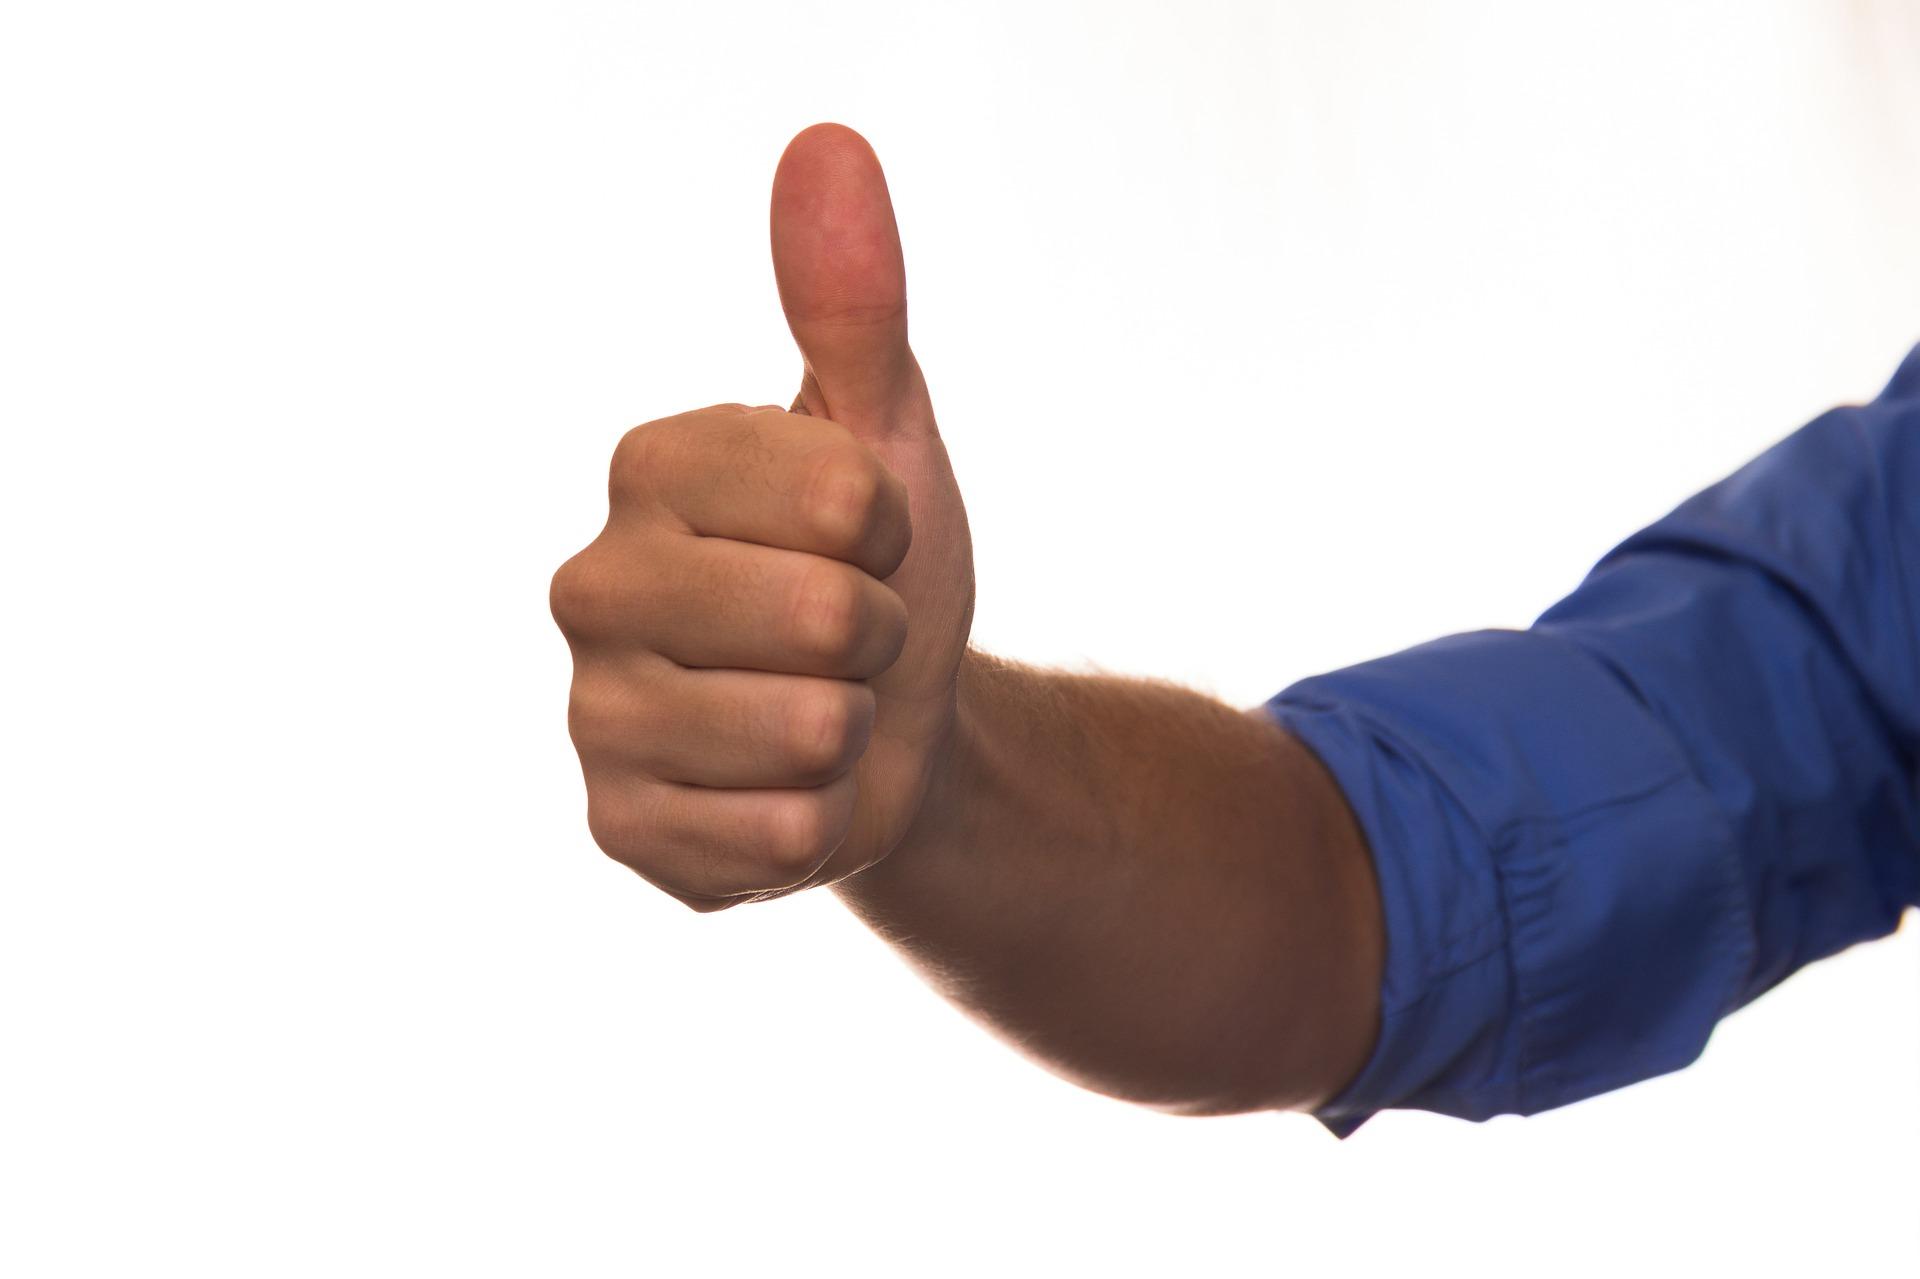 Positiivne tagasiside